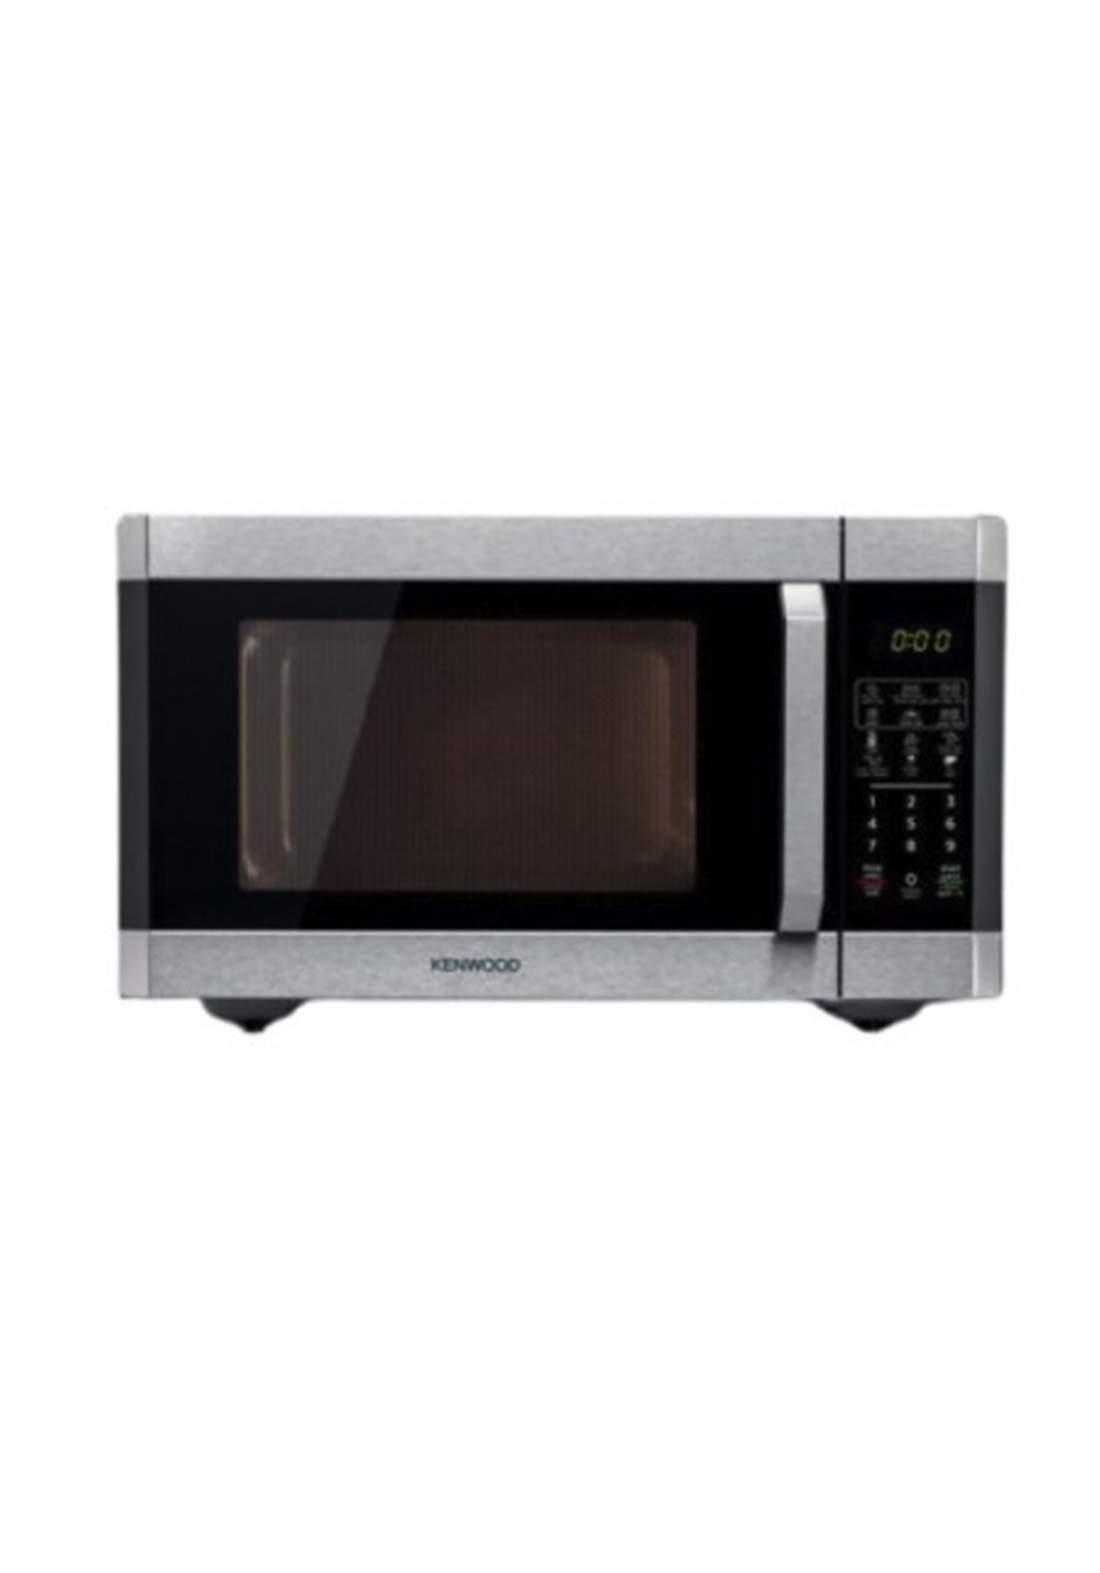 Kenwood  MWM42 Microwave Oven 1100W 42L  مايكروويف طعام